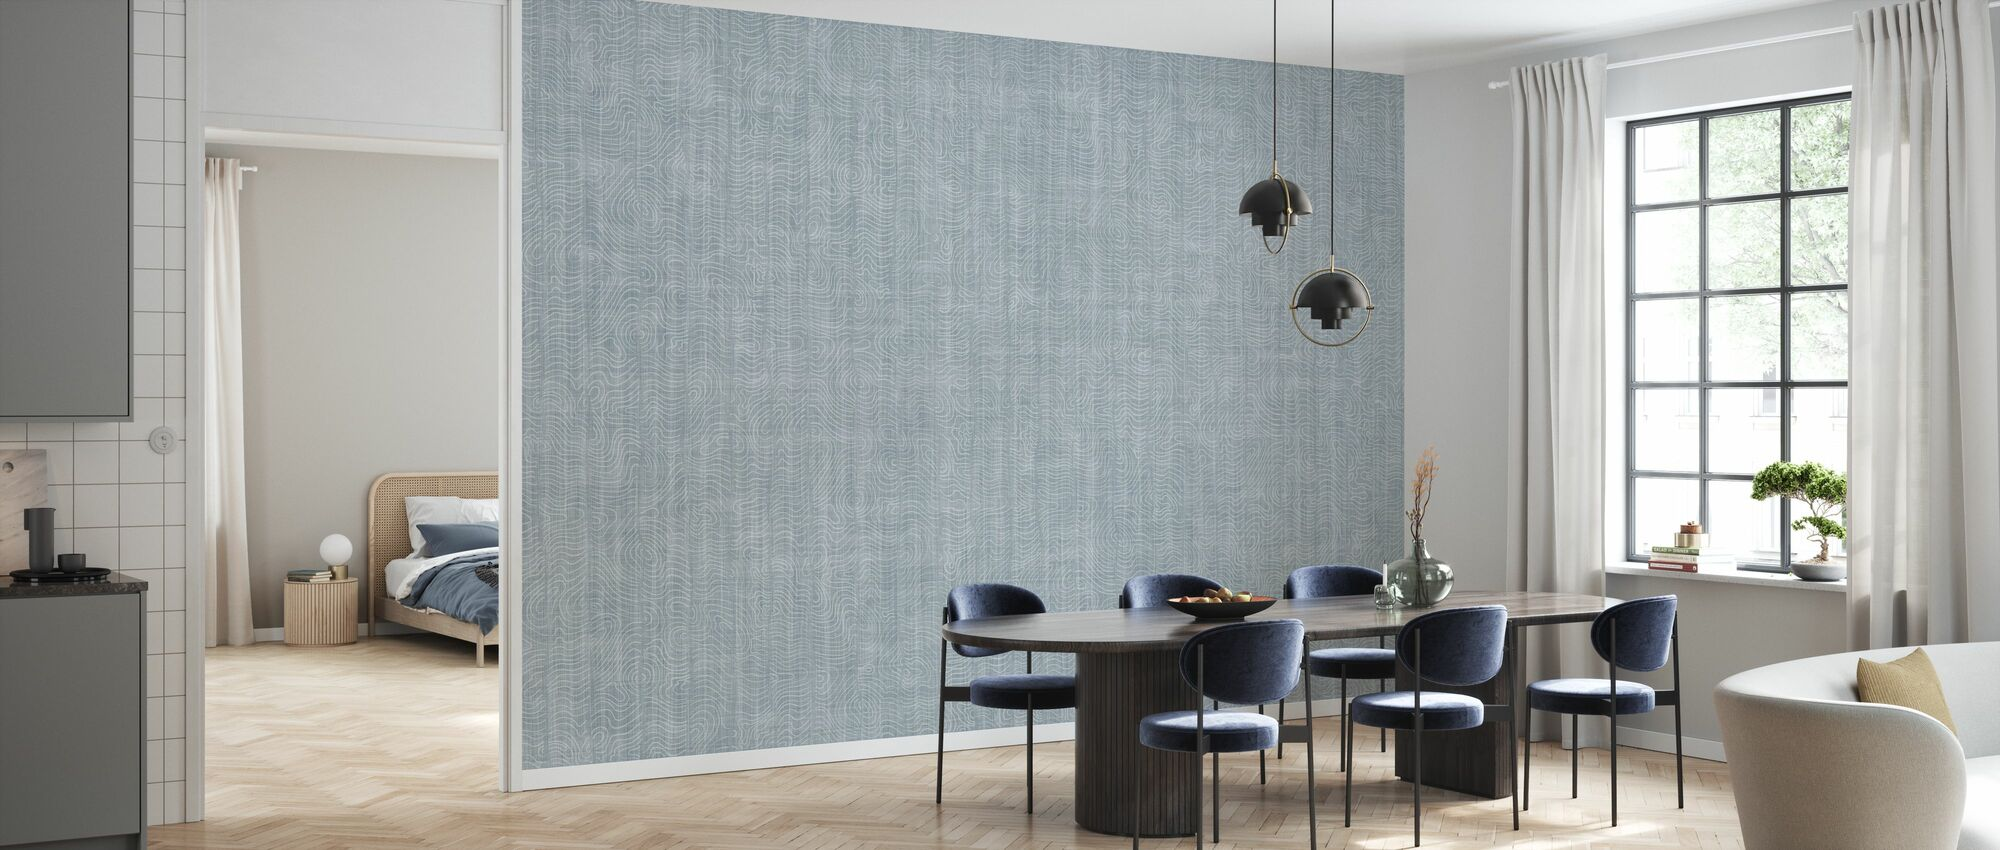 Nami - Misty Blue - Wallpaper - Kitchen